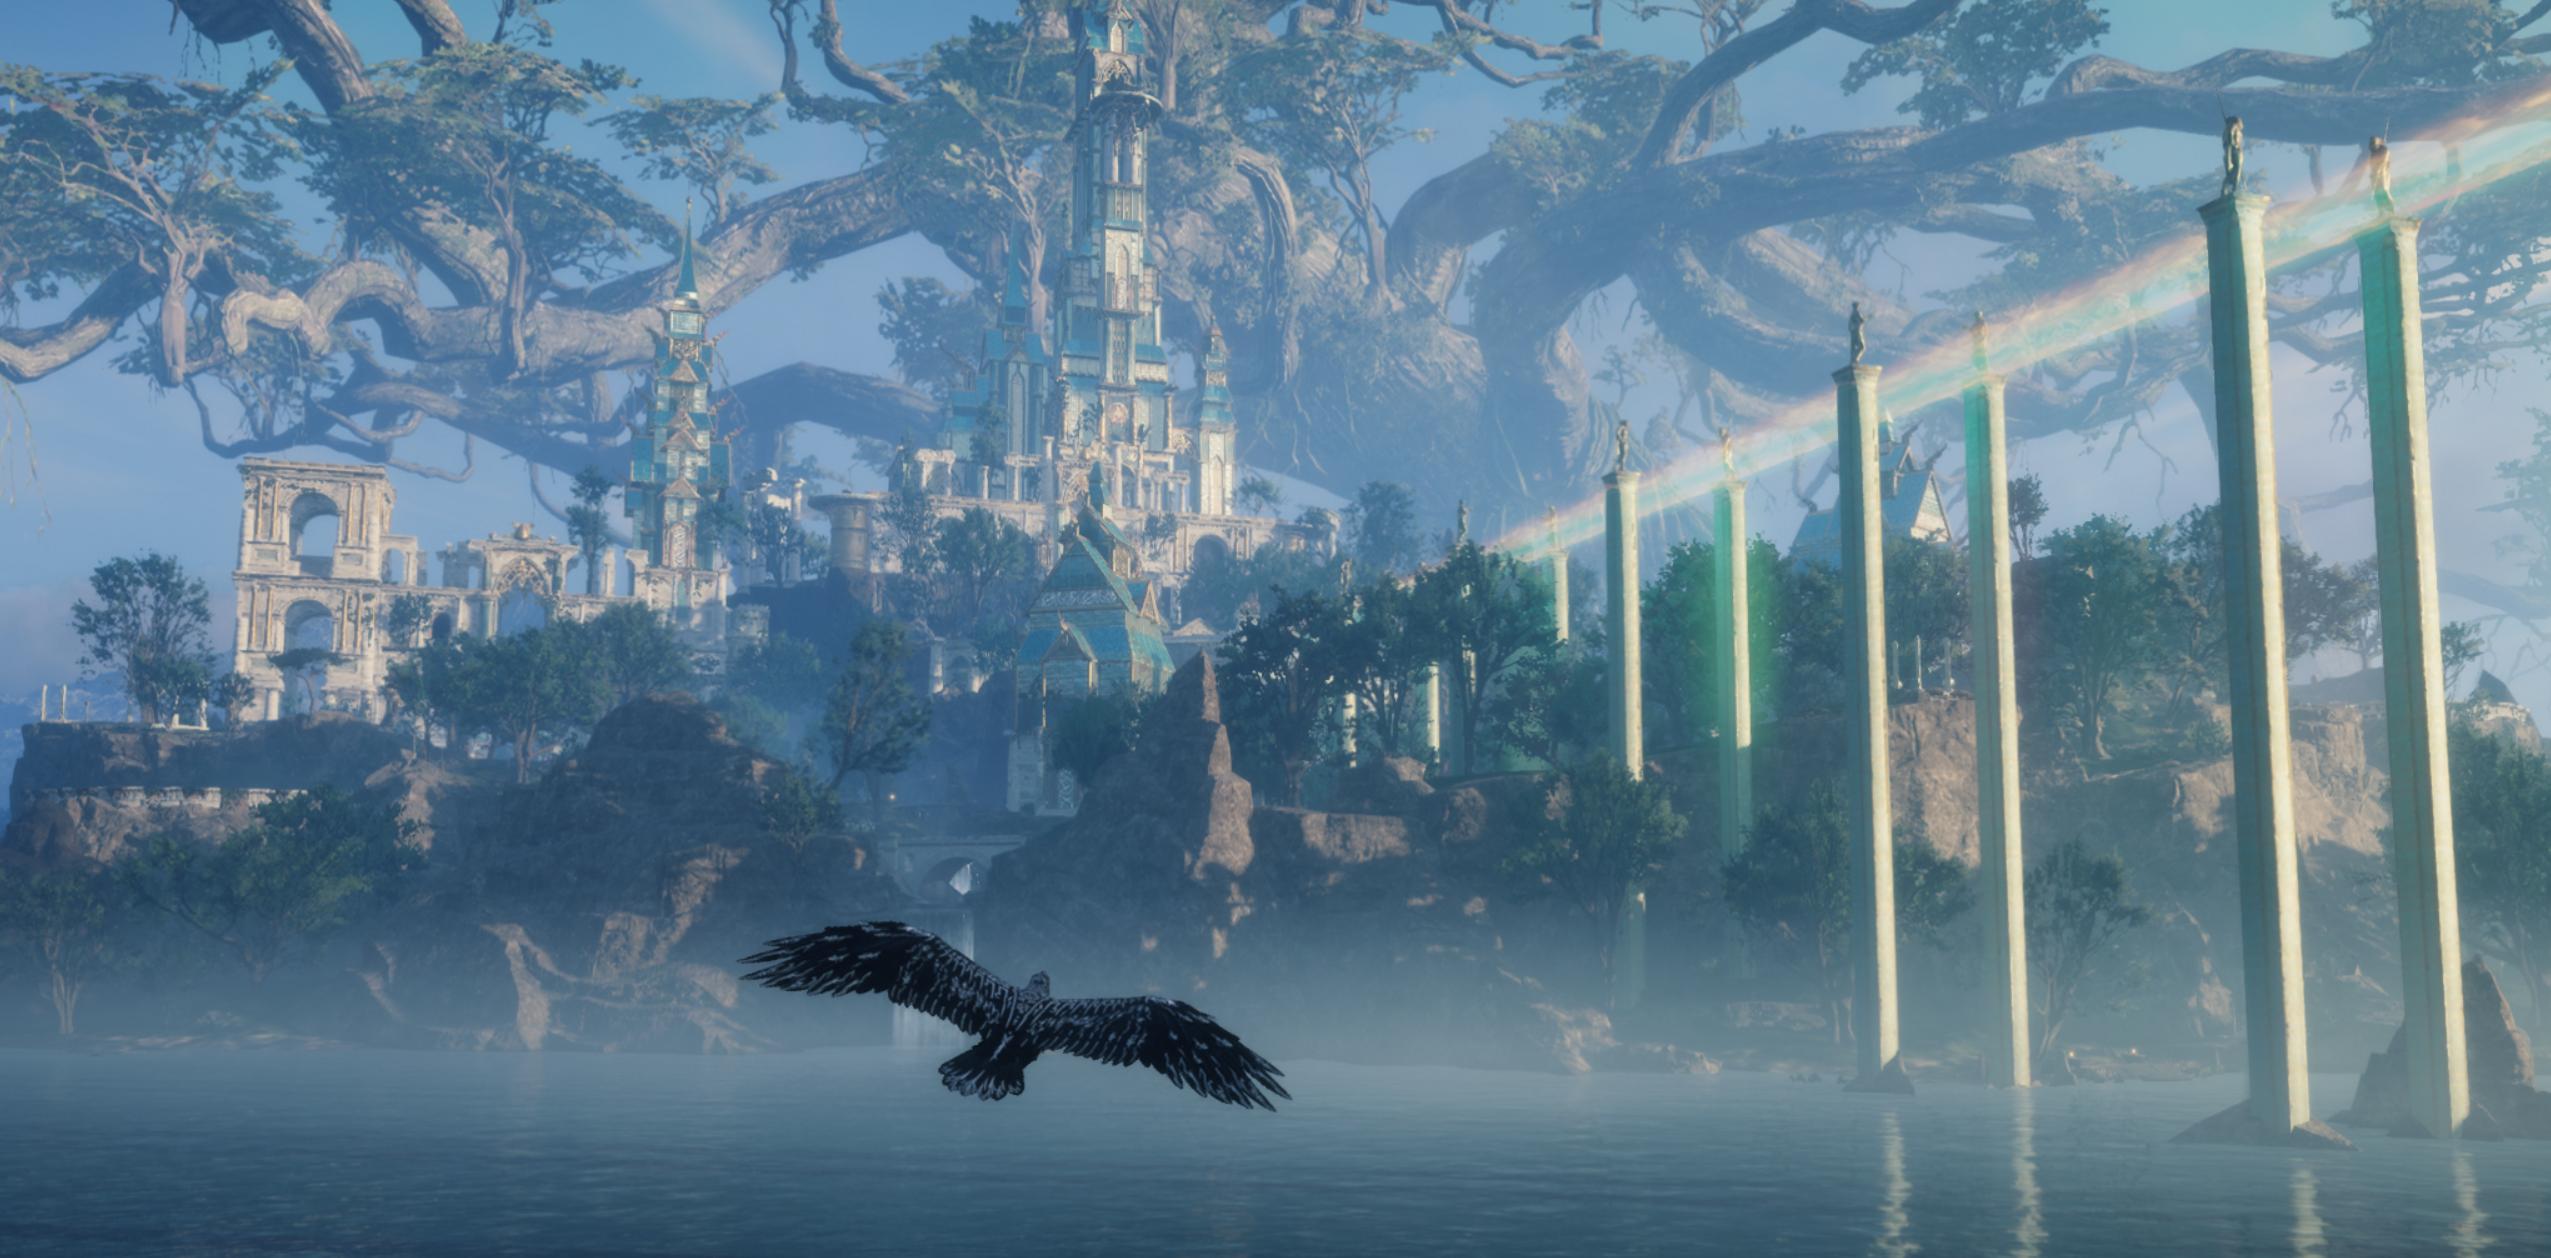 Assassins Creed Valhalla Landscape Mountains Trees Blue Raven Green Asgard 2551x1258